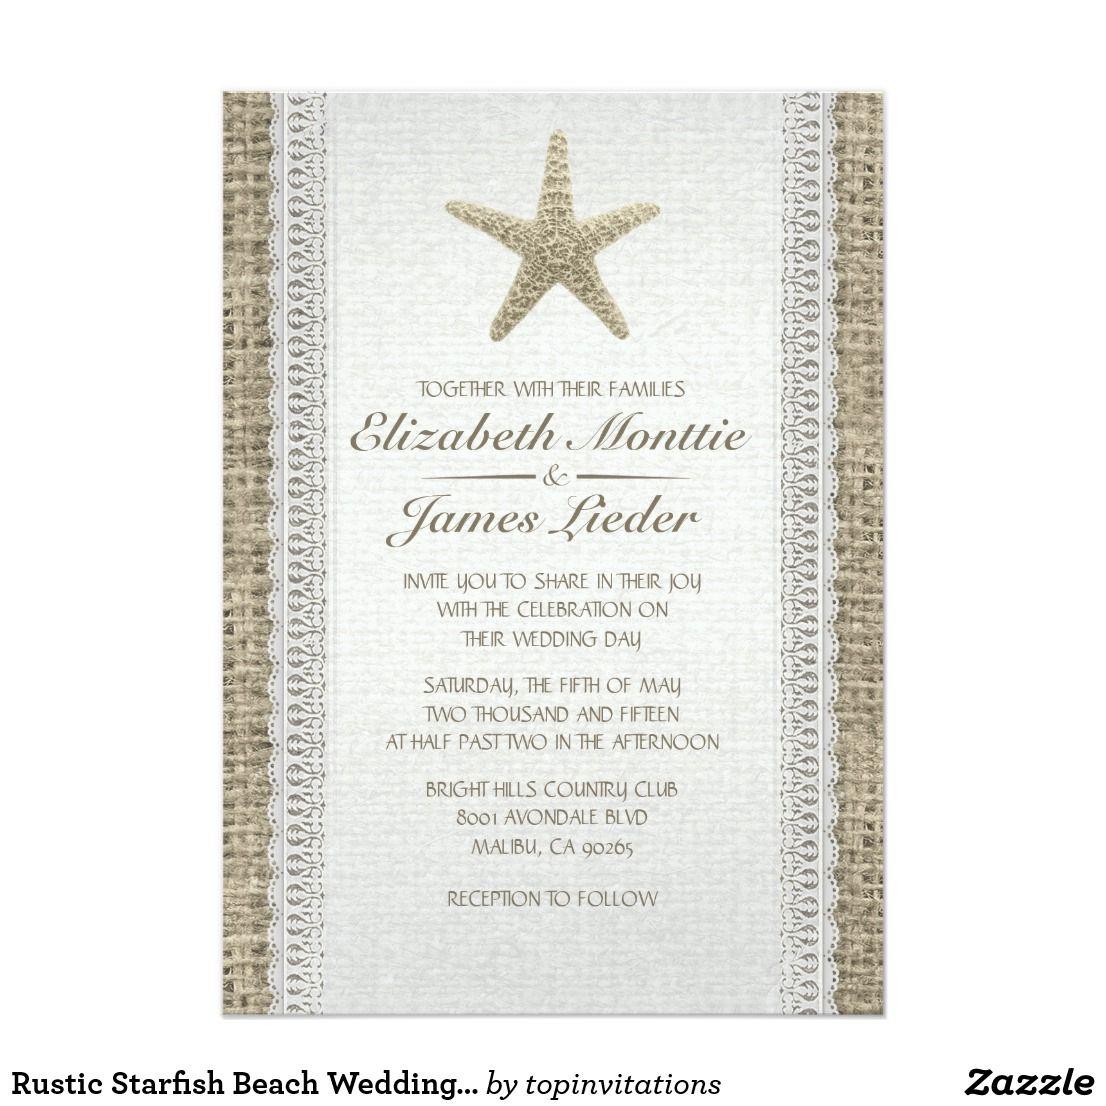 Rustic Starfish Beach Wedding Invitations | Beach Wedding ...